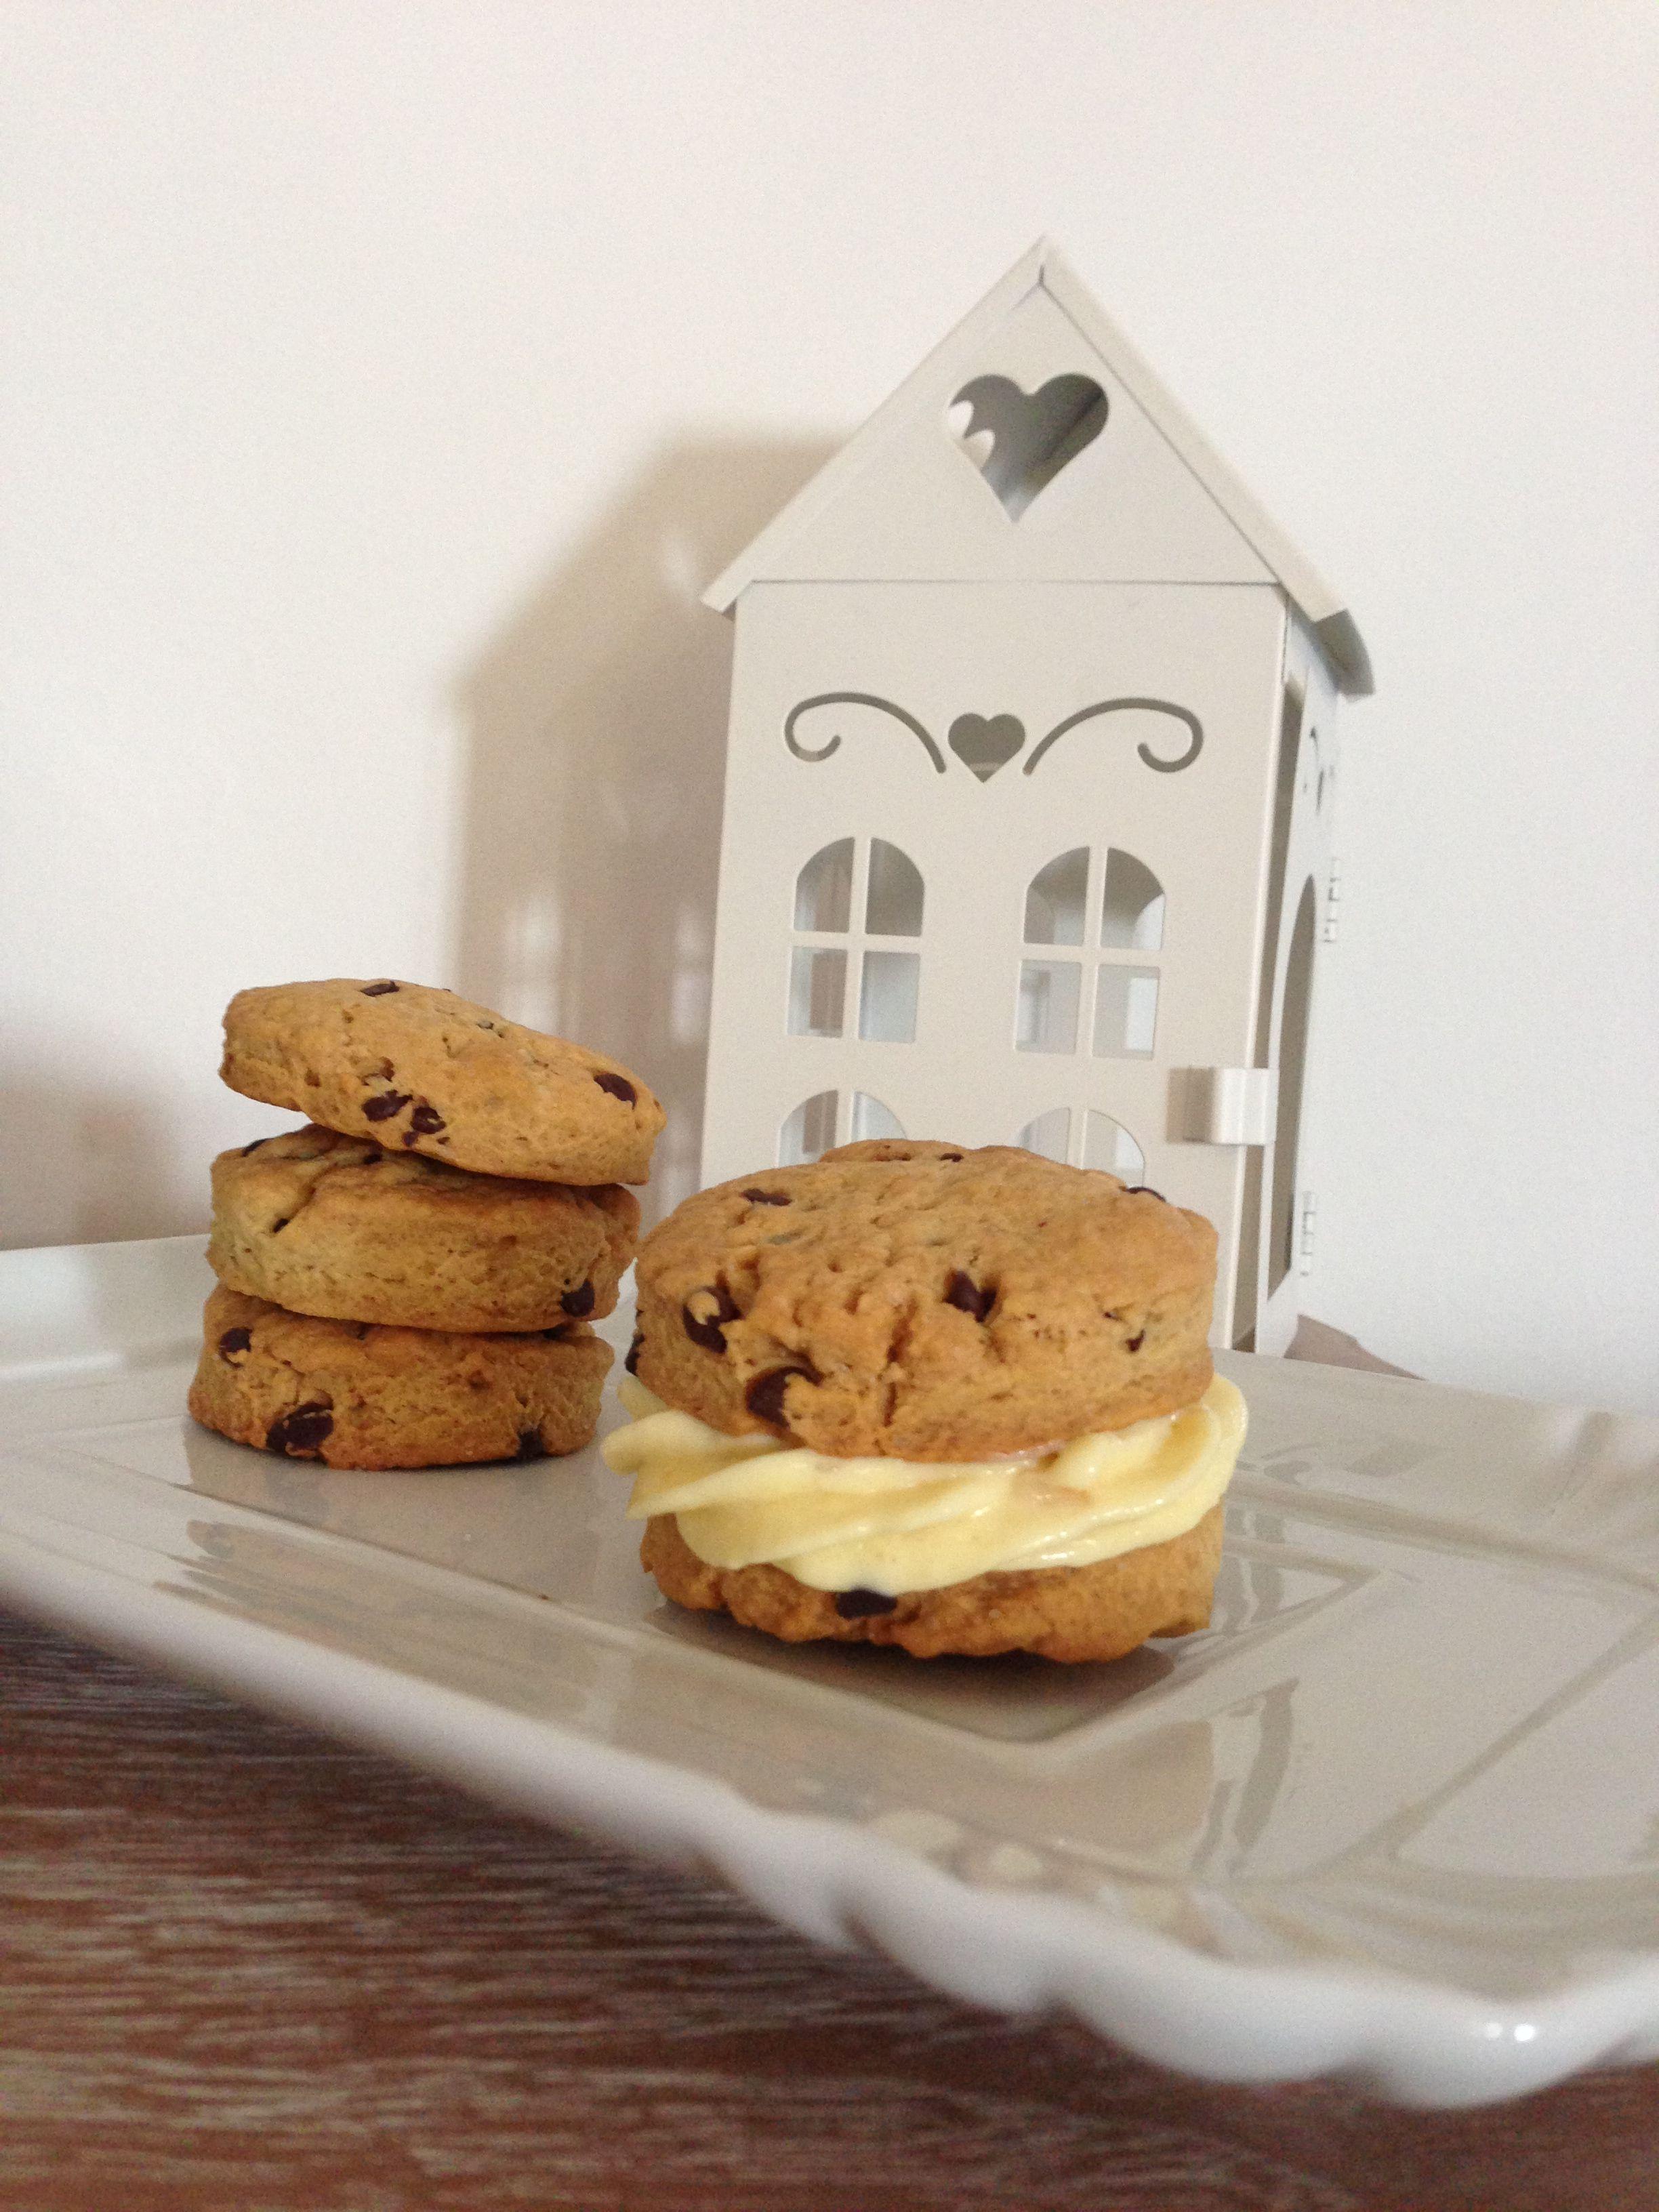 Cookies and ice cream homemade